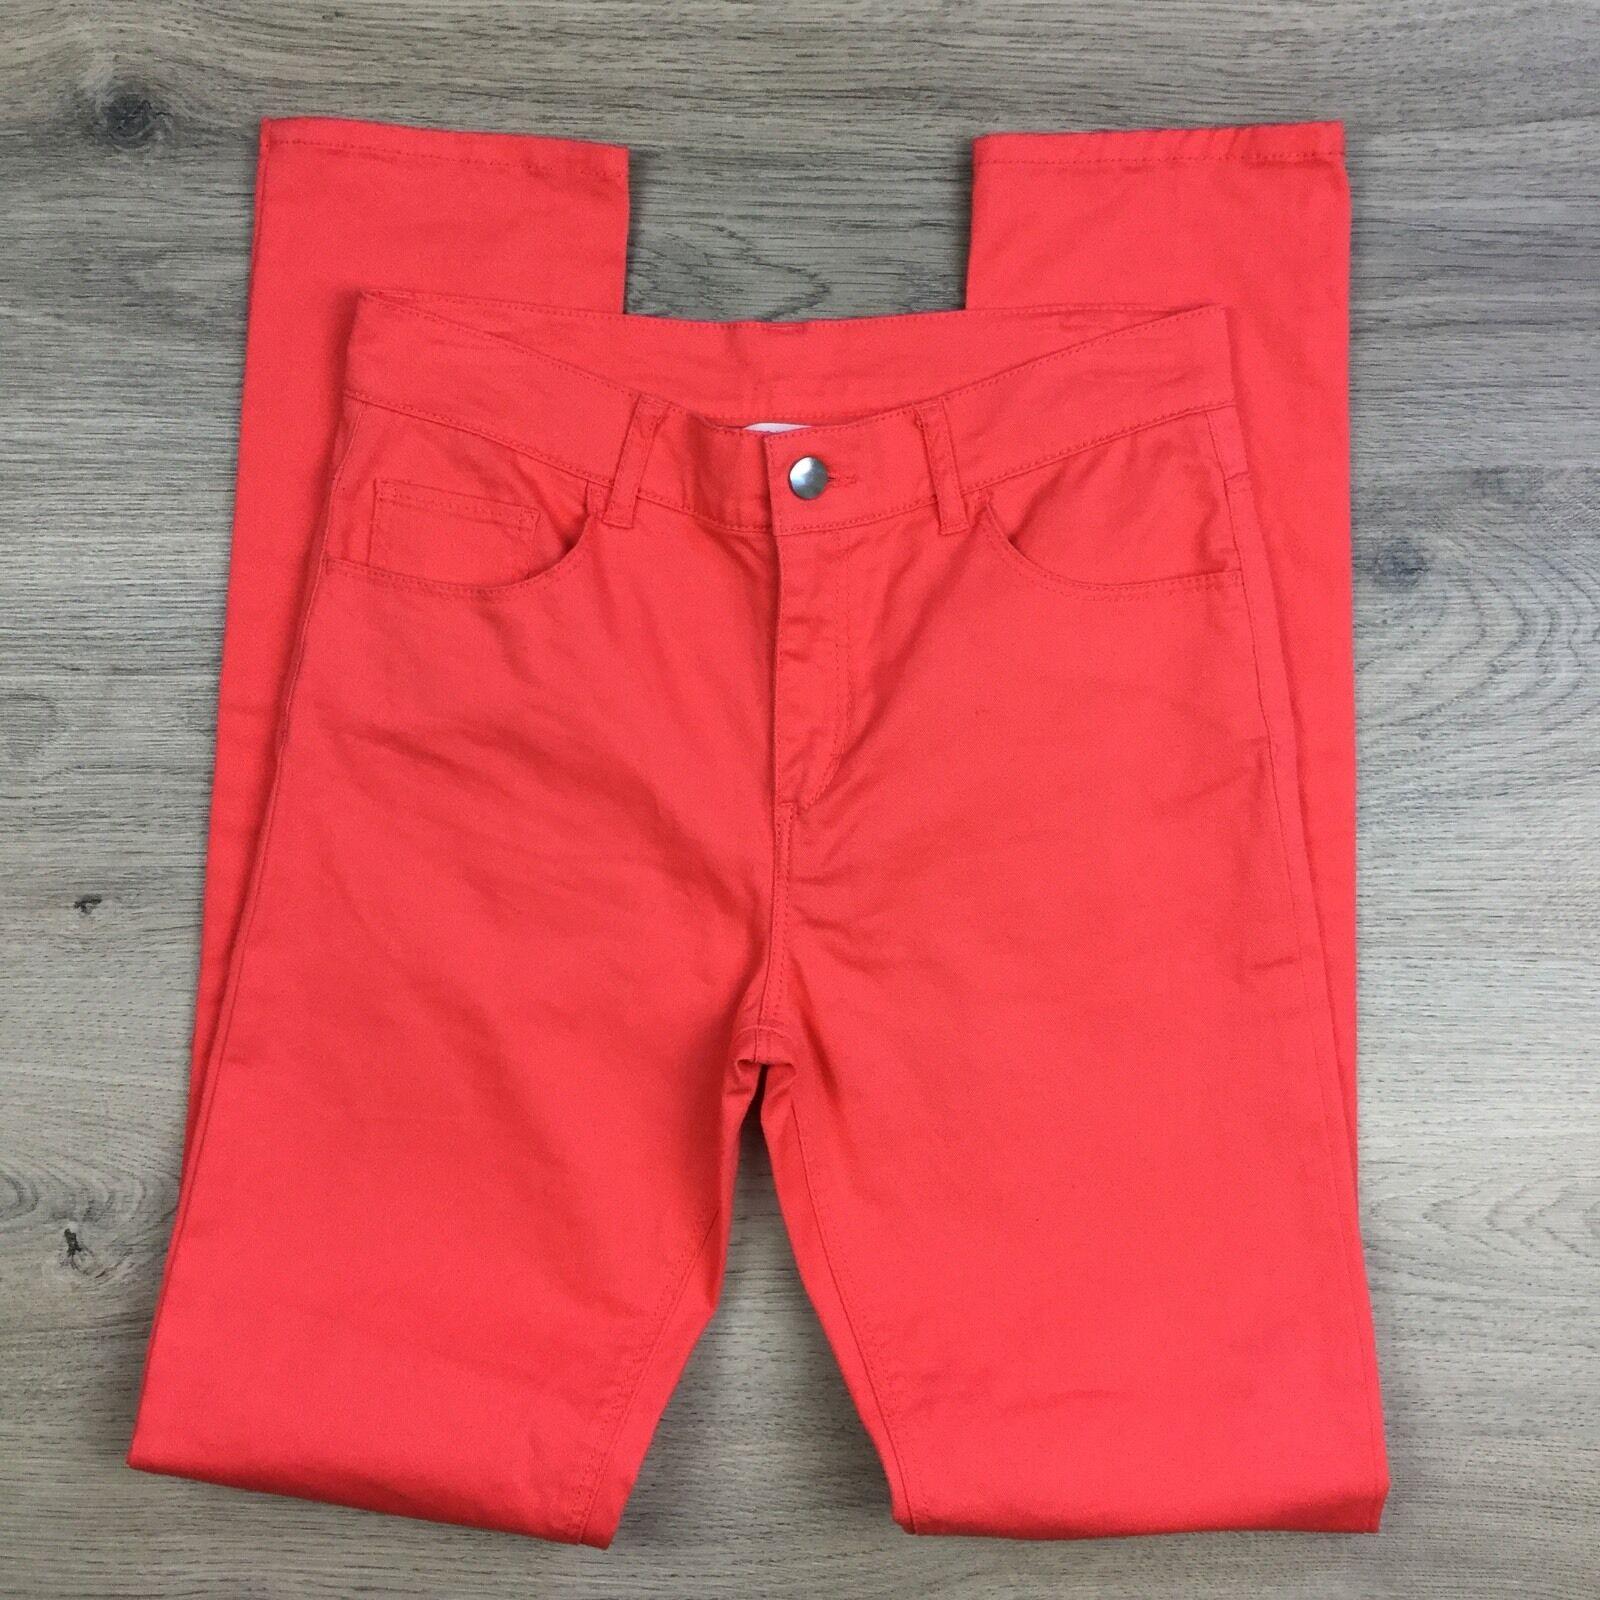 H&M Coral Skinny Leg Jeans Youth Men's Jeans Size W27 L31 (Q11)